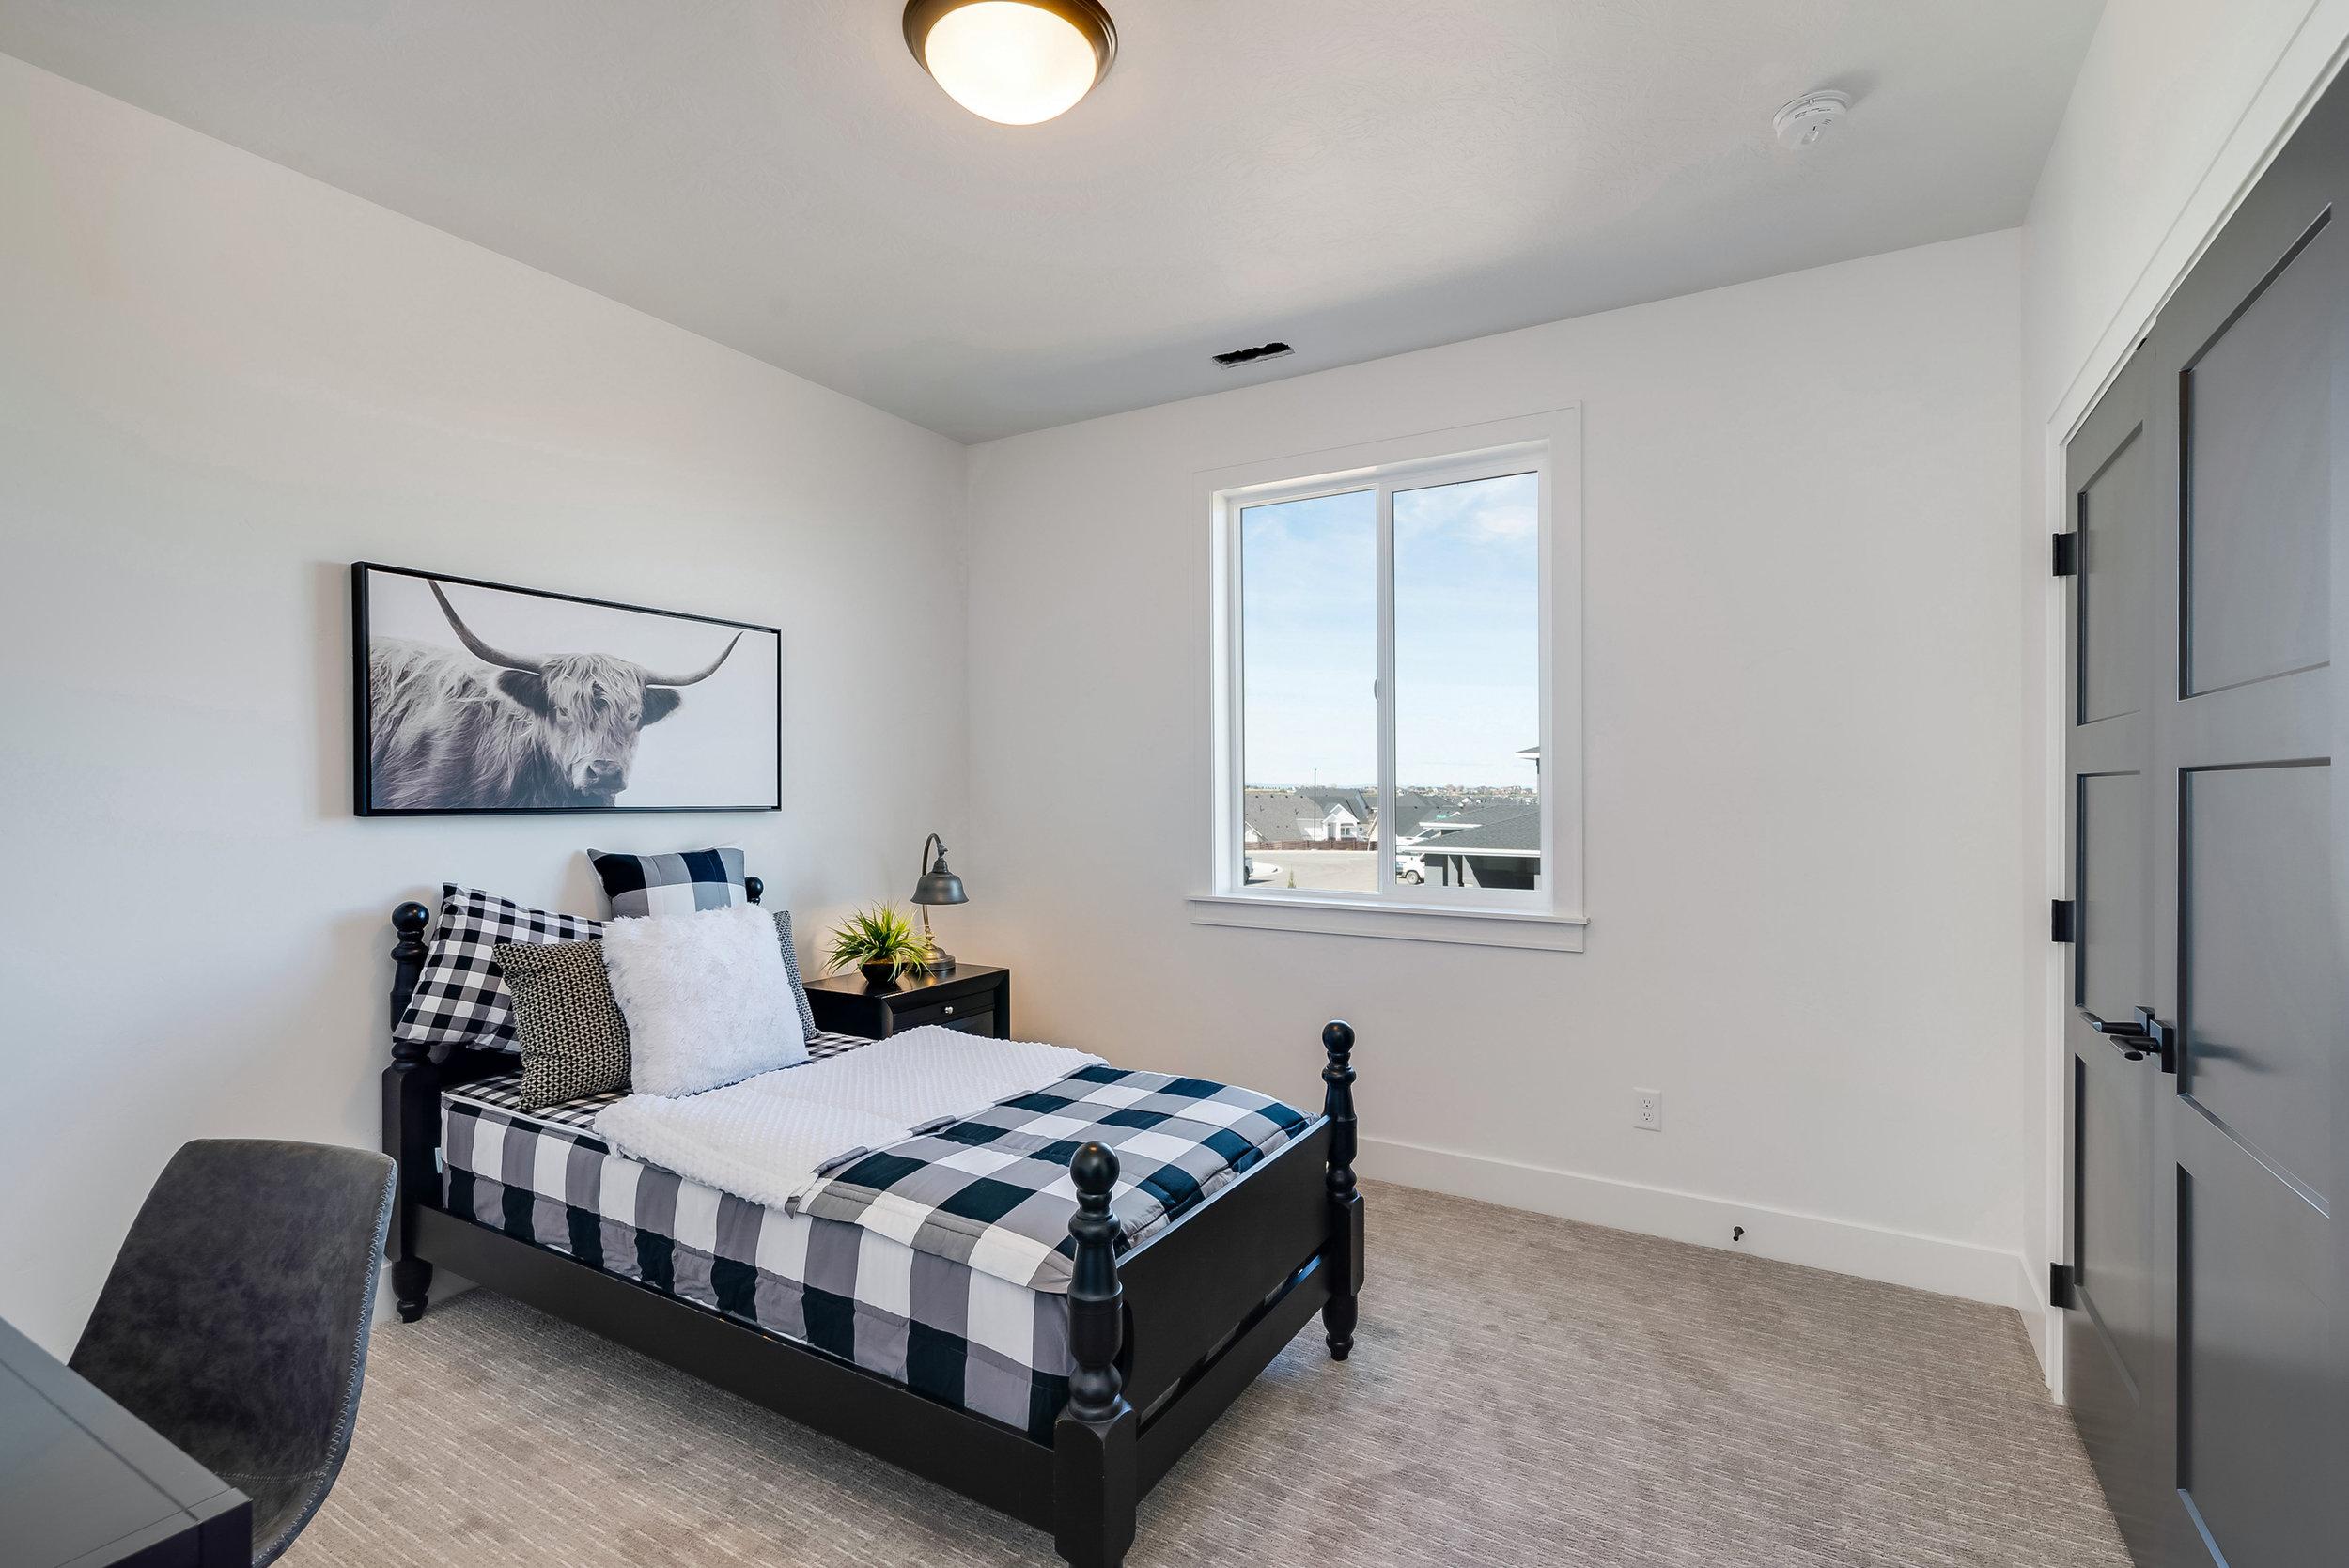 51-Bedroom.jpg